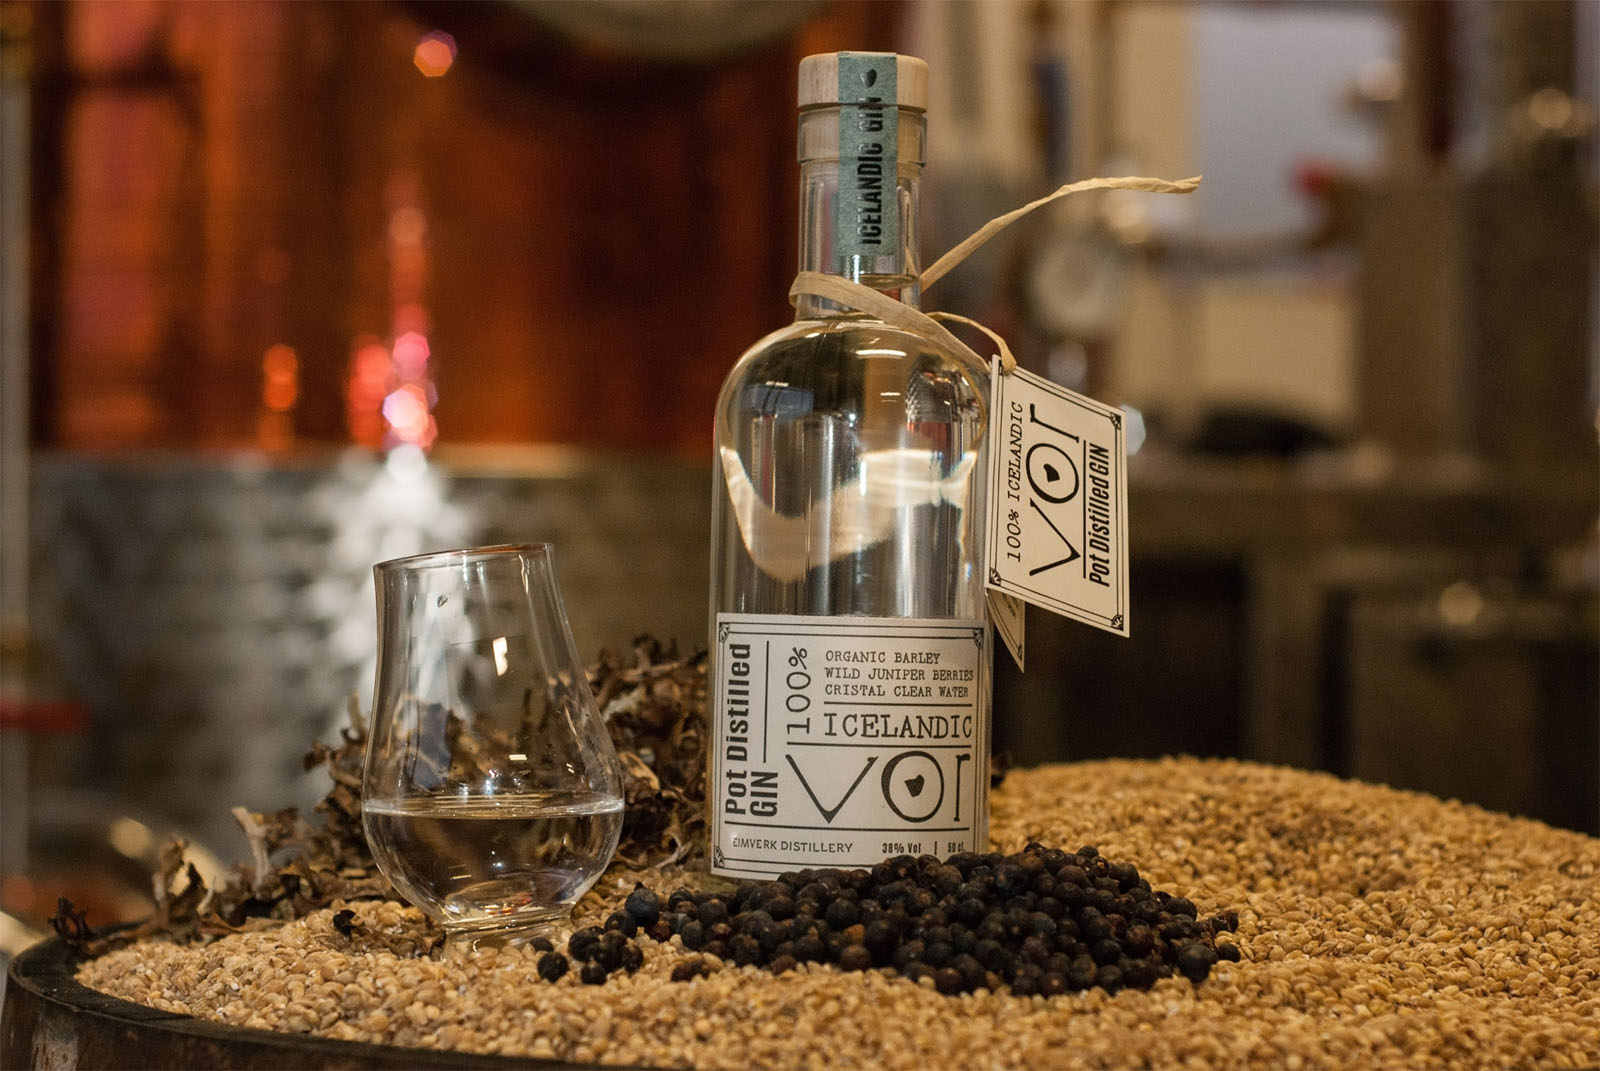 gin sul preis gin sul aus hamburg manufactum altonaer spirituosen manufaktur dry gin sul zeit. Black Bedroom Furniture Sets. Home Design Ideas